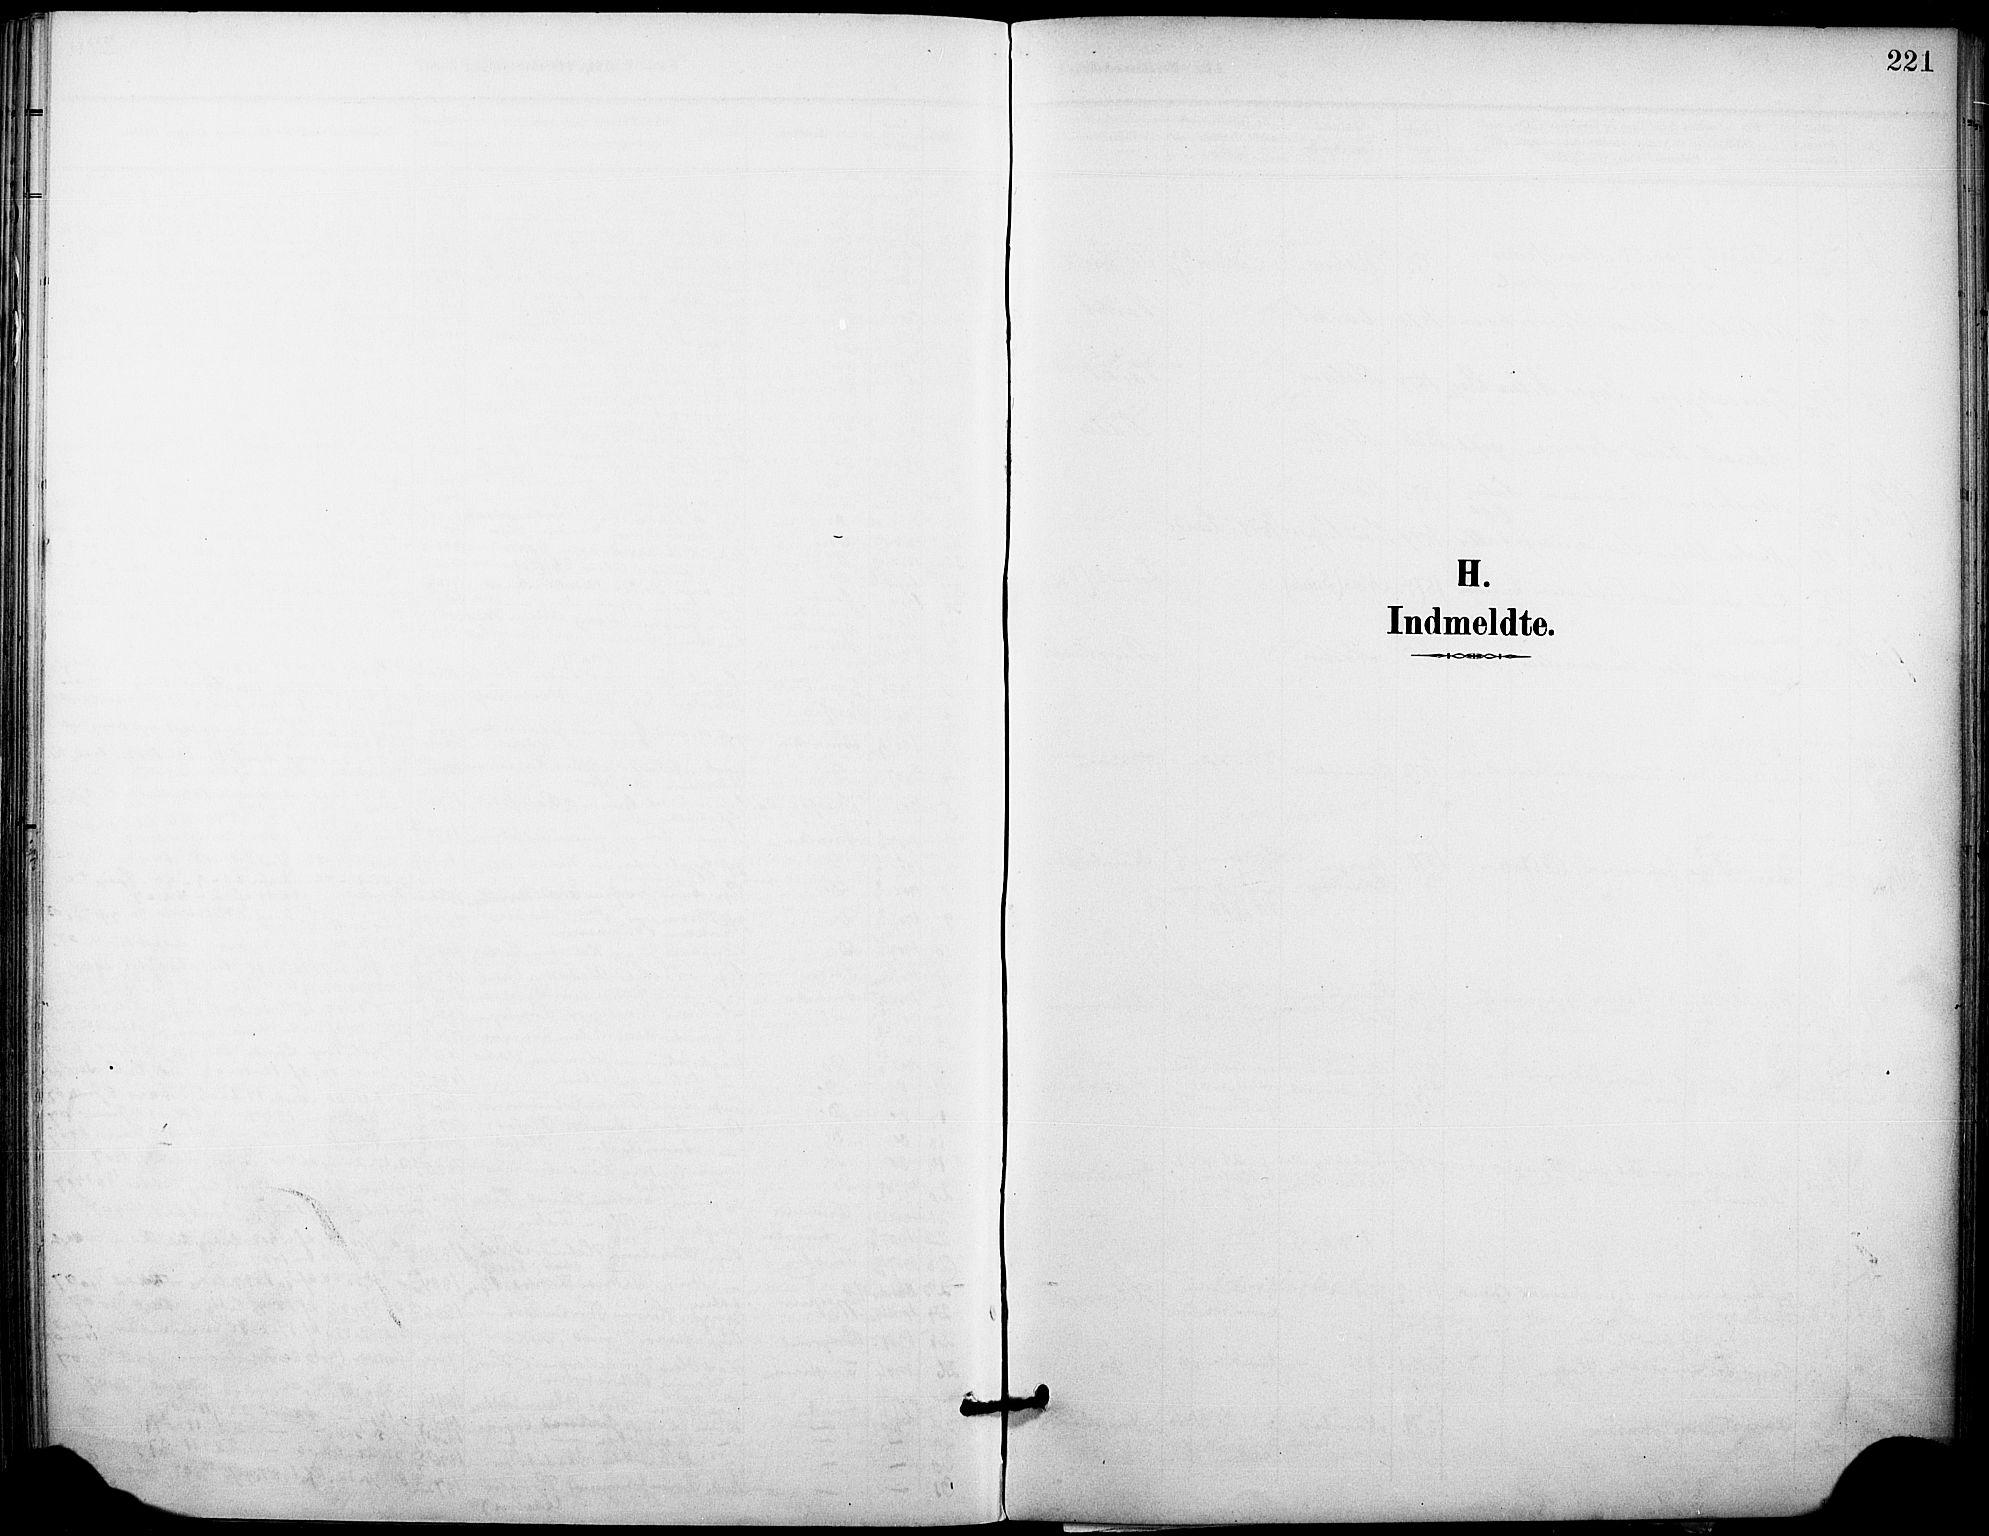 SAKO, Holla kirkebøker, F/Fa/L0010: Ministerialbok nr. 10, 1897-1907, s. 221